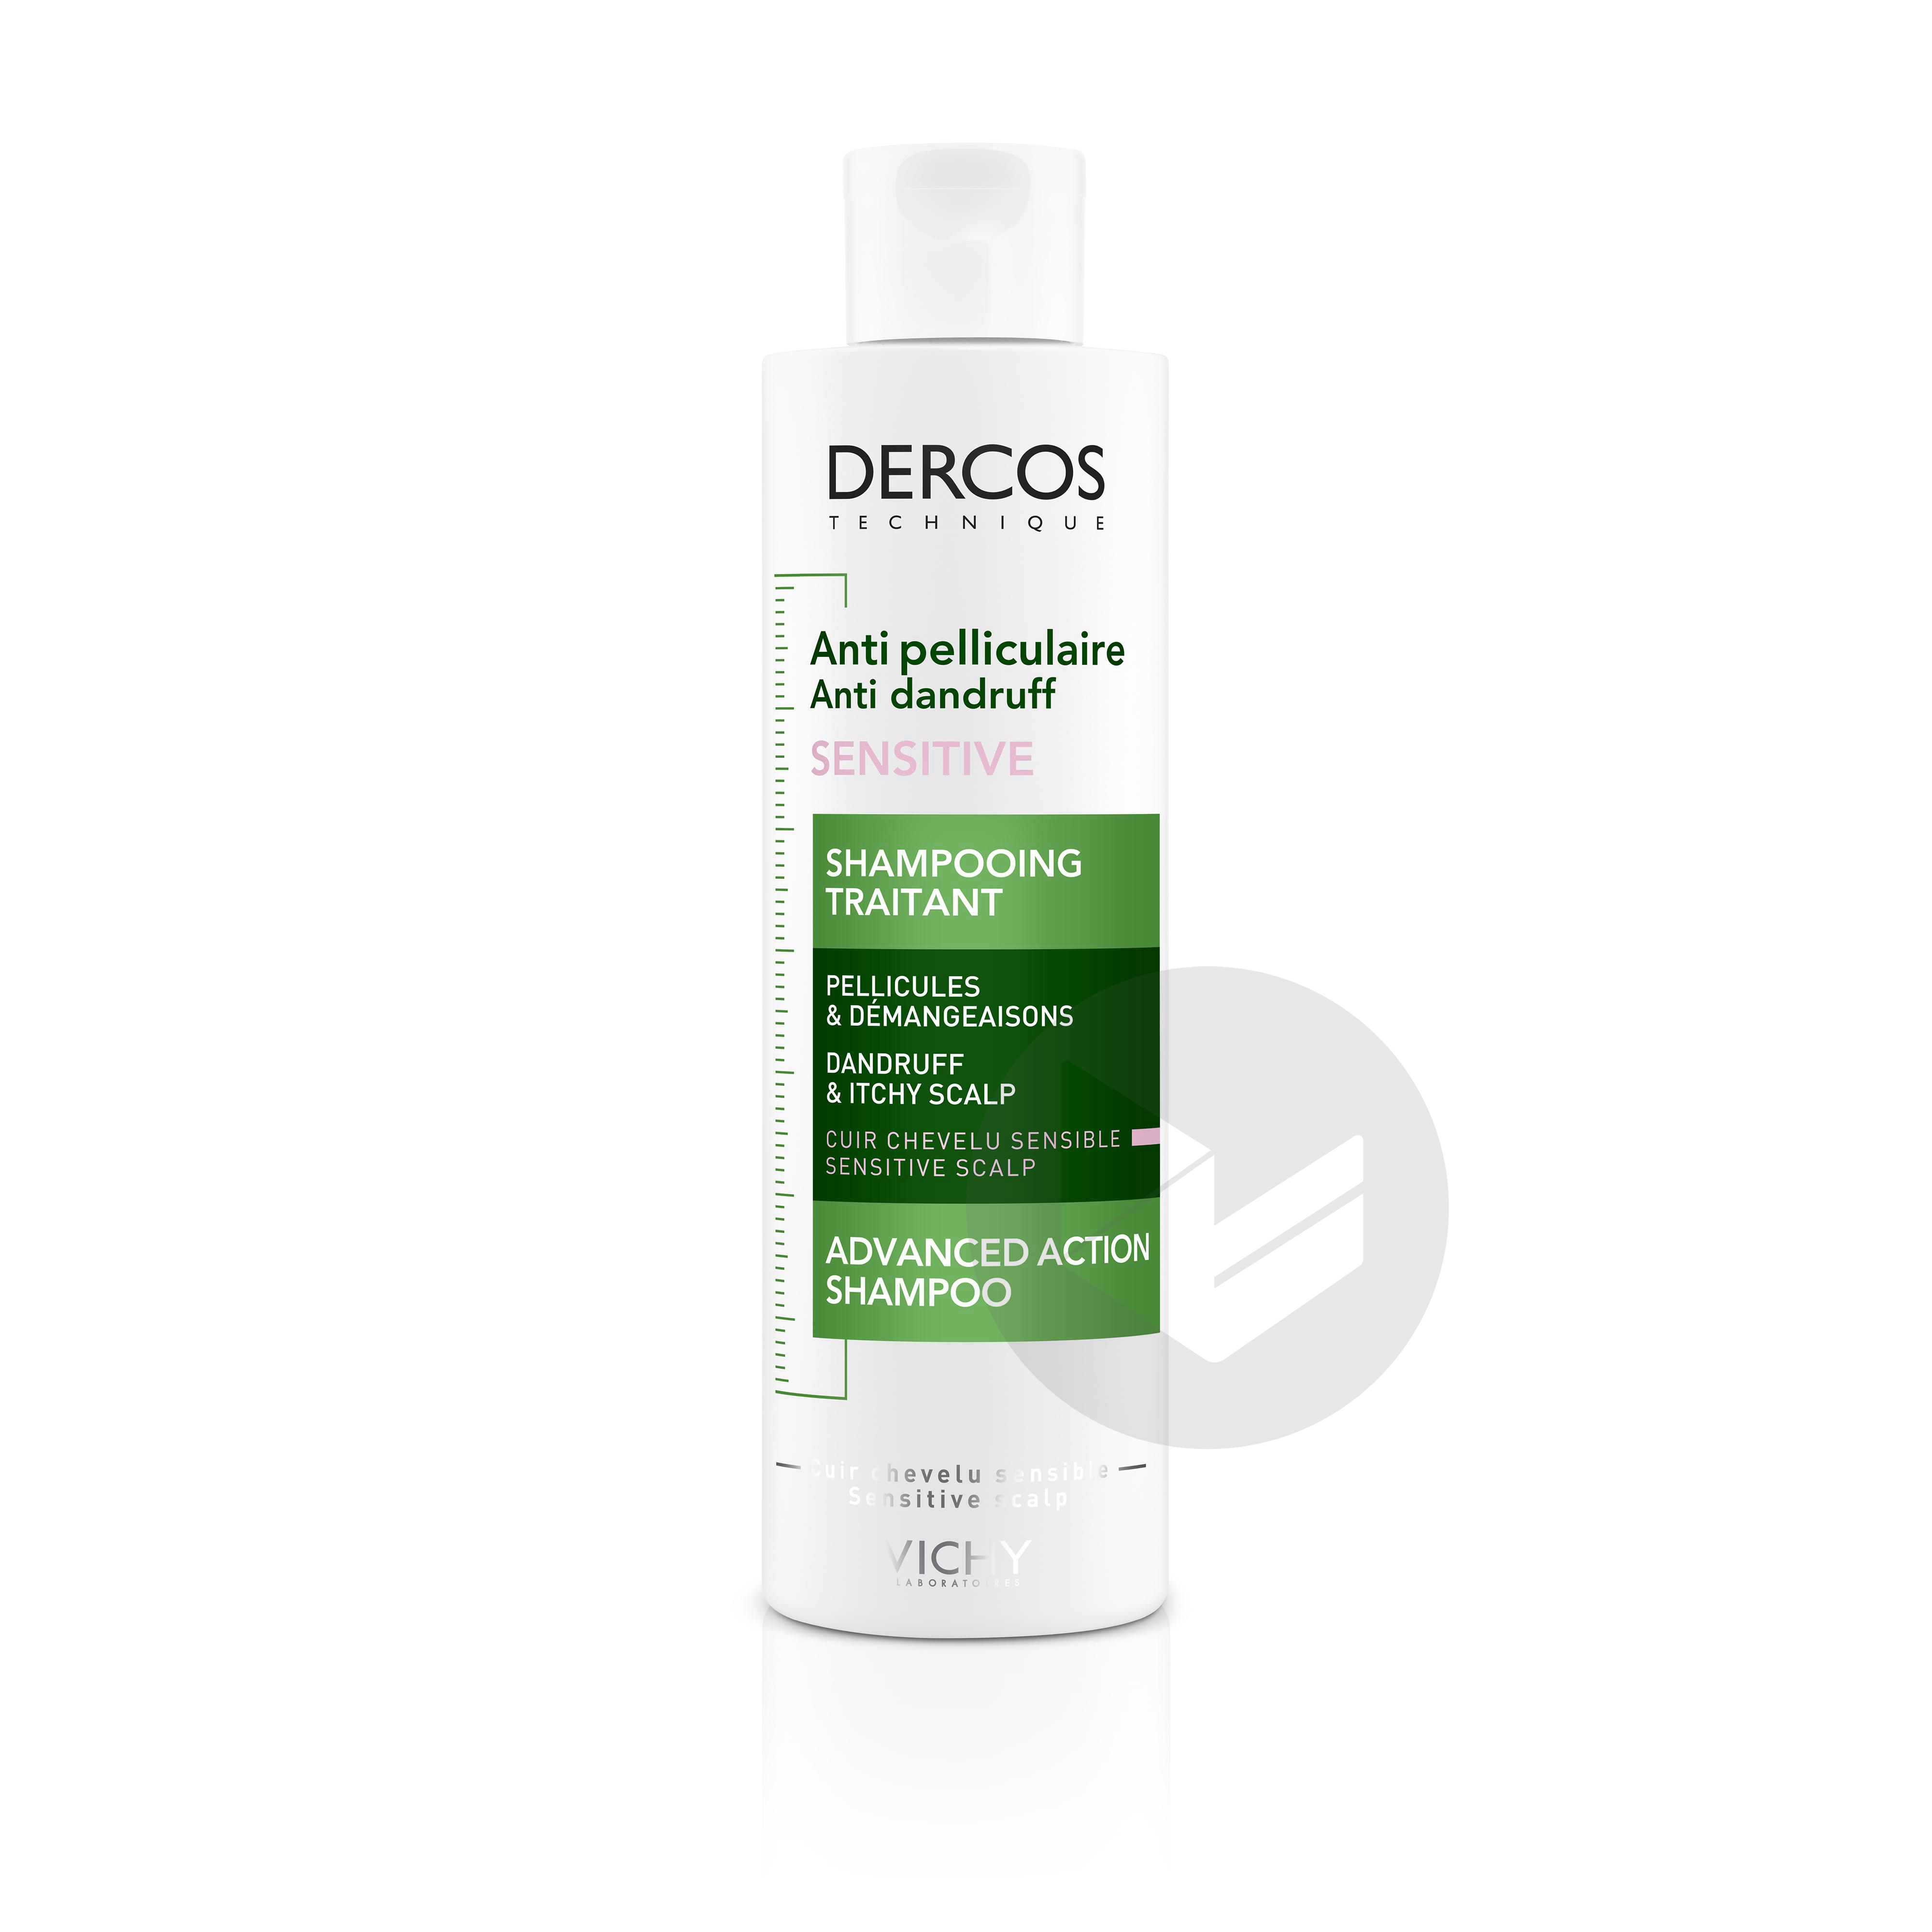 Dercos Technique Anti-pelliculaire Sensitive Shampooing traitant Cuir chevelu sensible